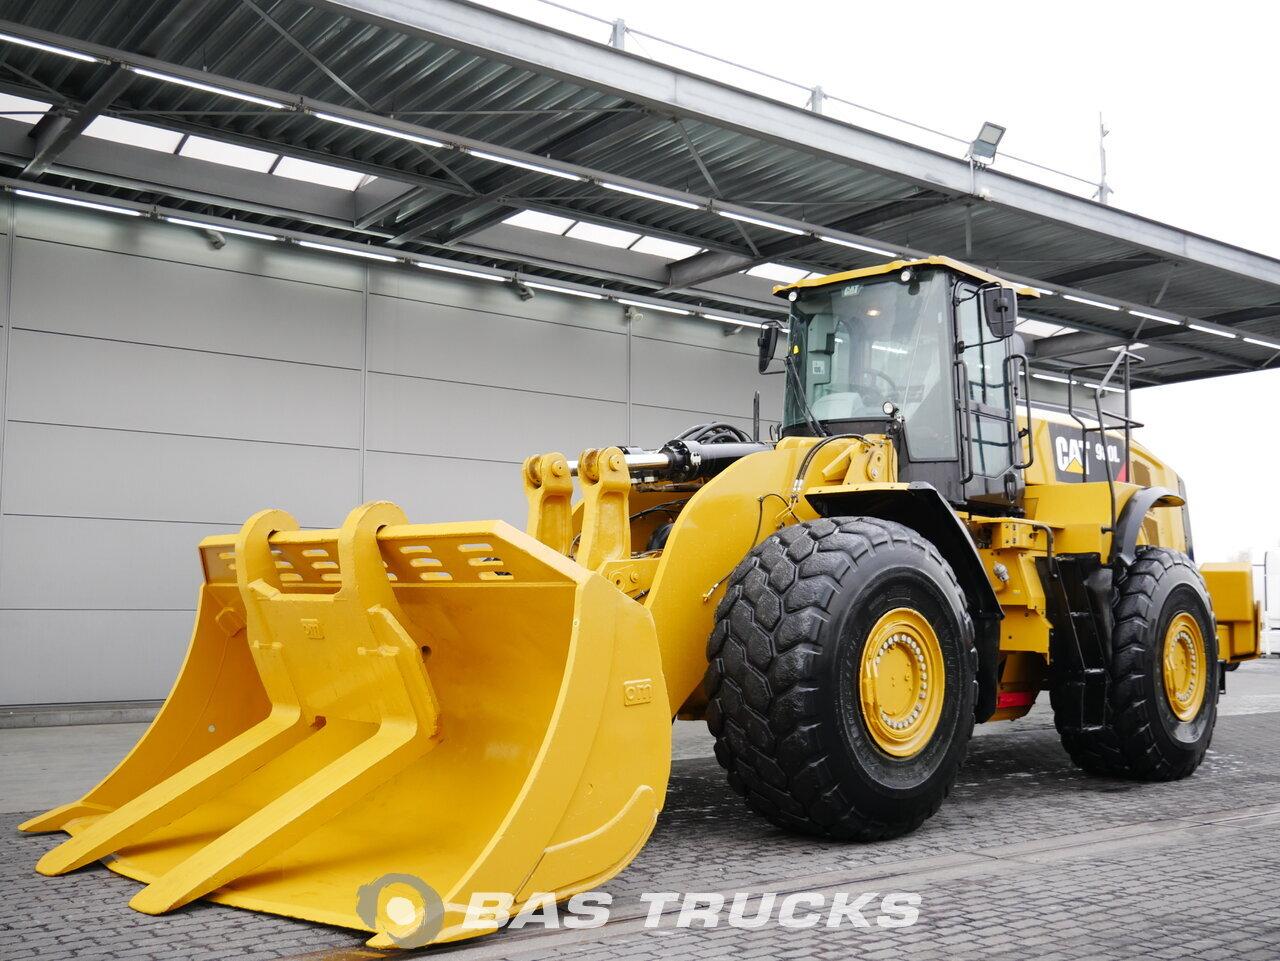 For sale at BAS Trucks: Caterpillar 980 L 4X4 01/2017